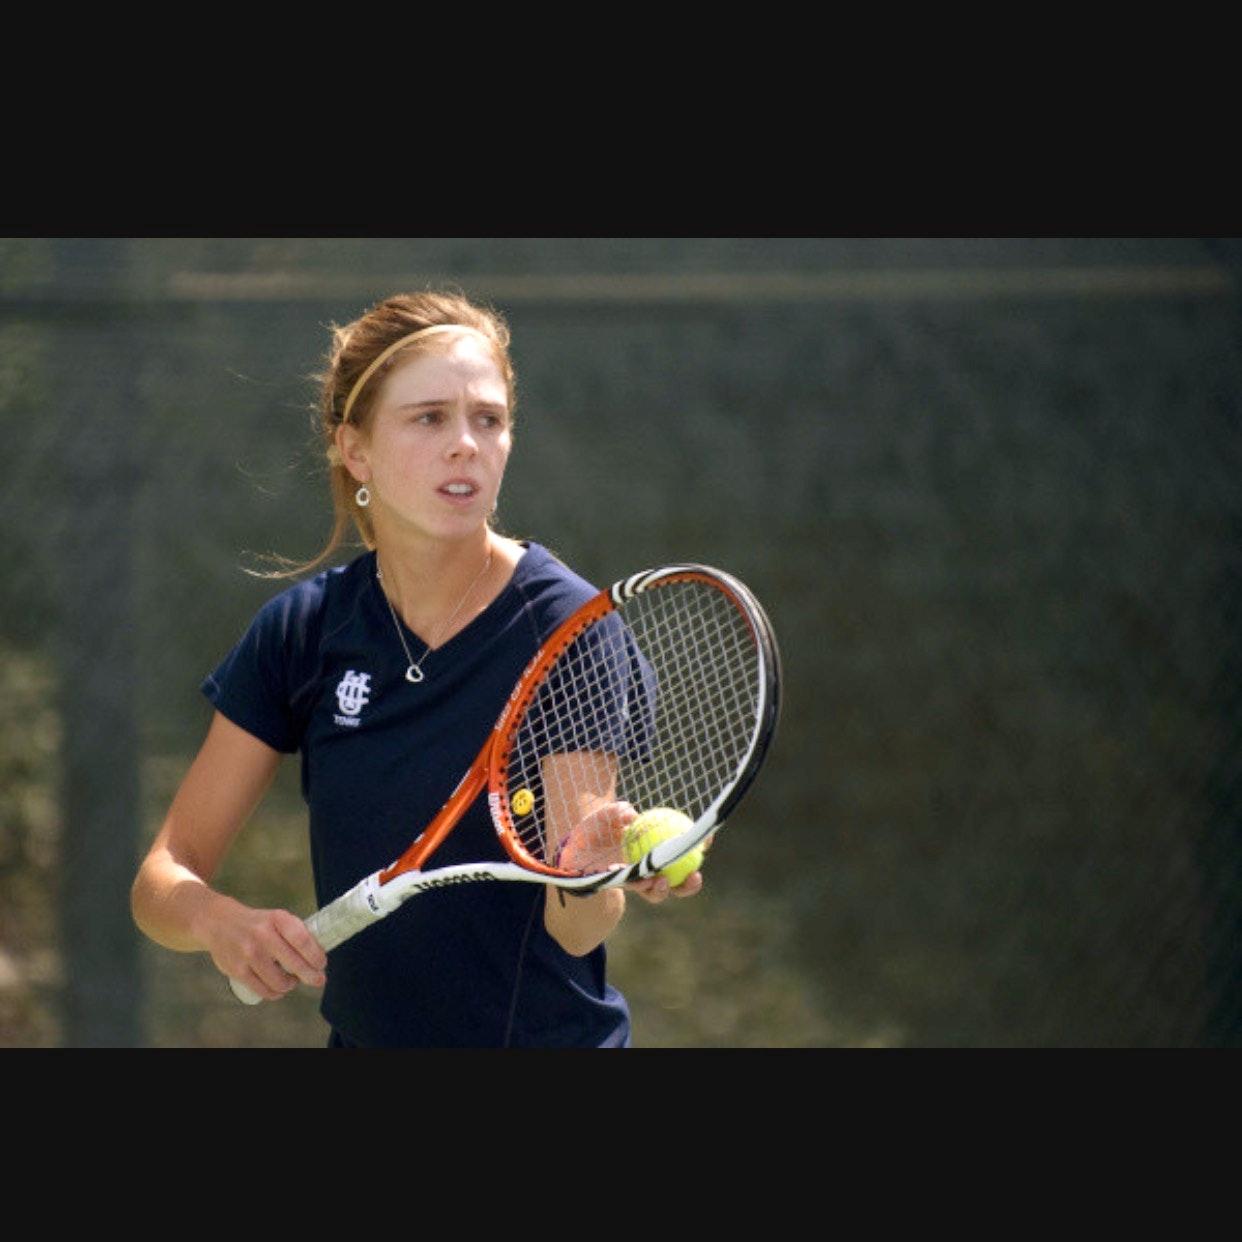 Kristina S. teaches tennis lessons in San Jose, CA